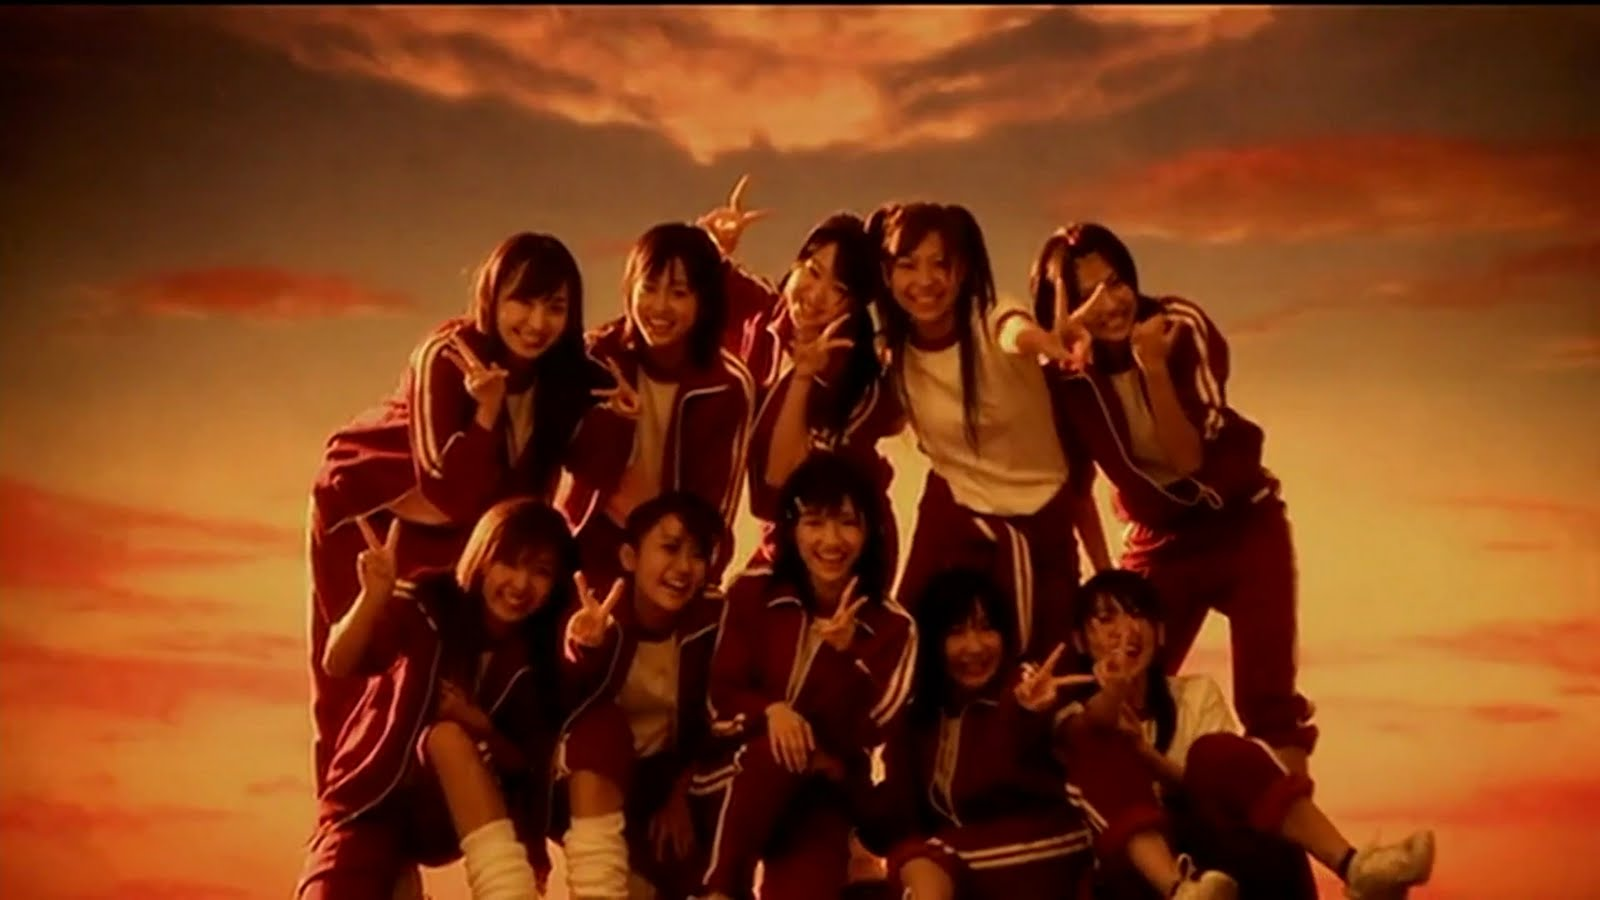 Download Akb48 Yuuhi Wo Miteiru Ka Rar free - helperfam